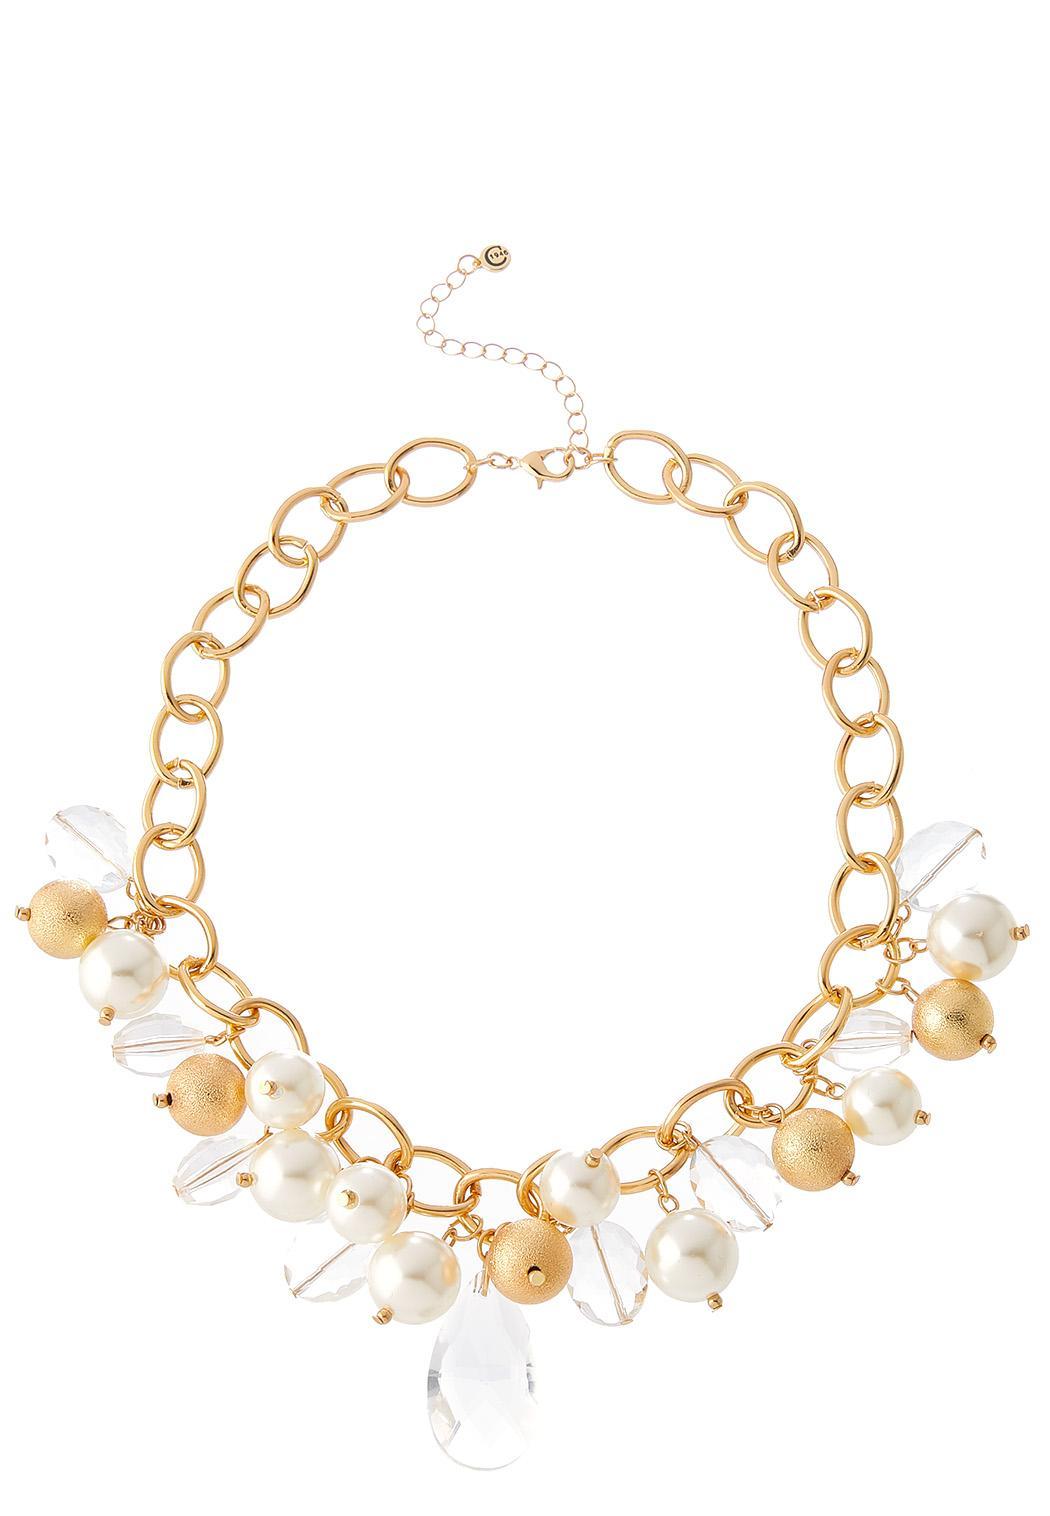 Gold And Ivory Charm Bracelet